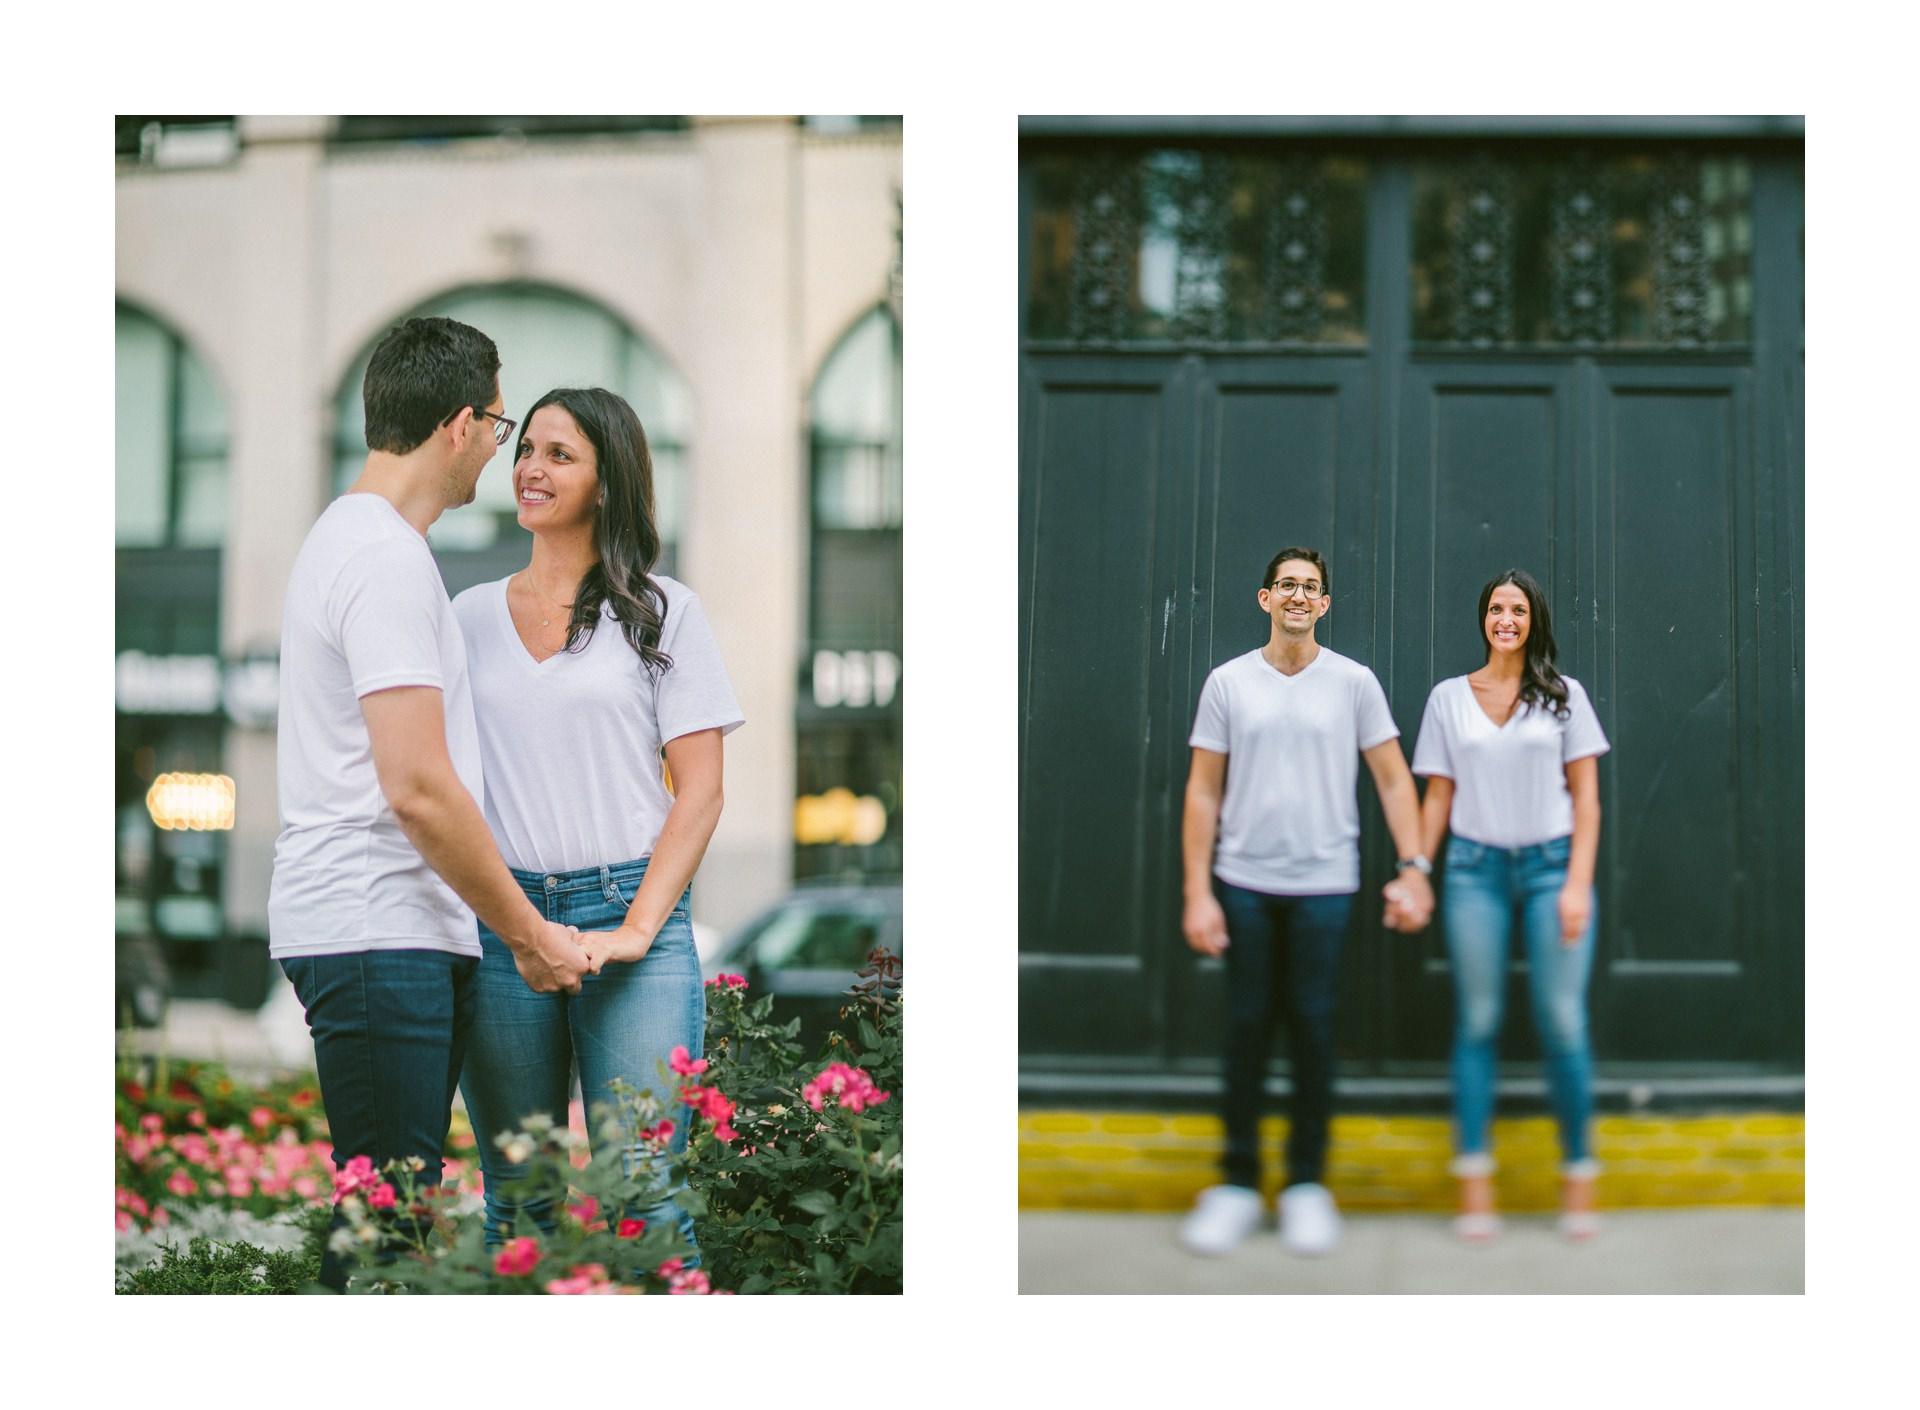 Detriot Engagement and Wedding Photographer 9.jpg